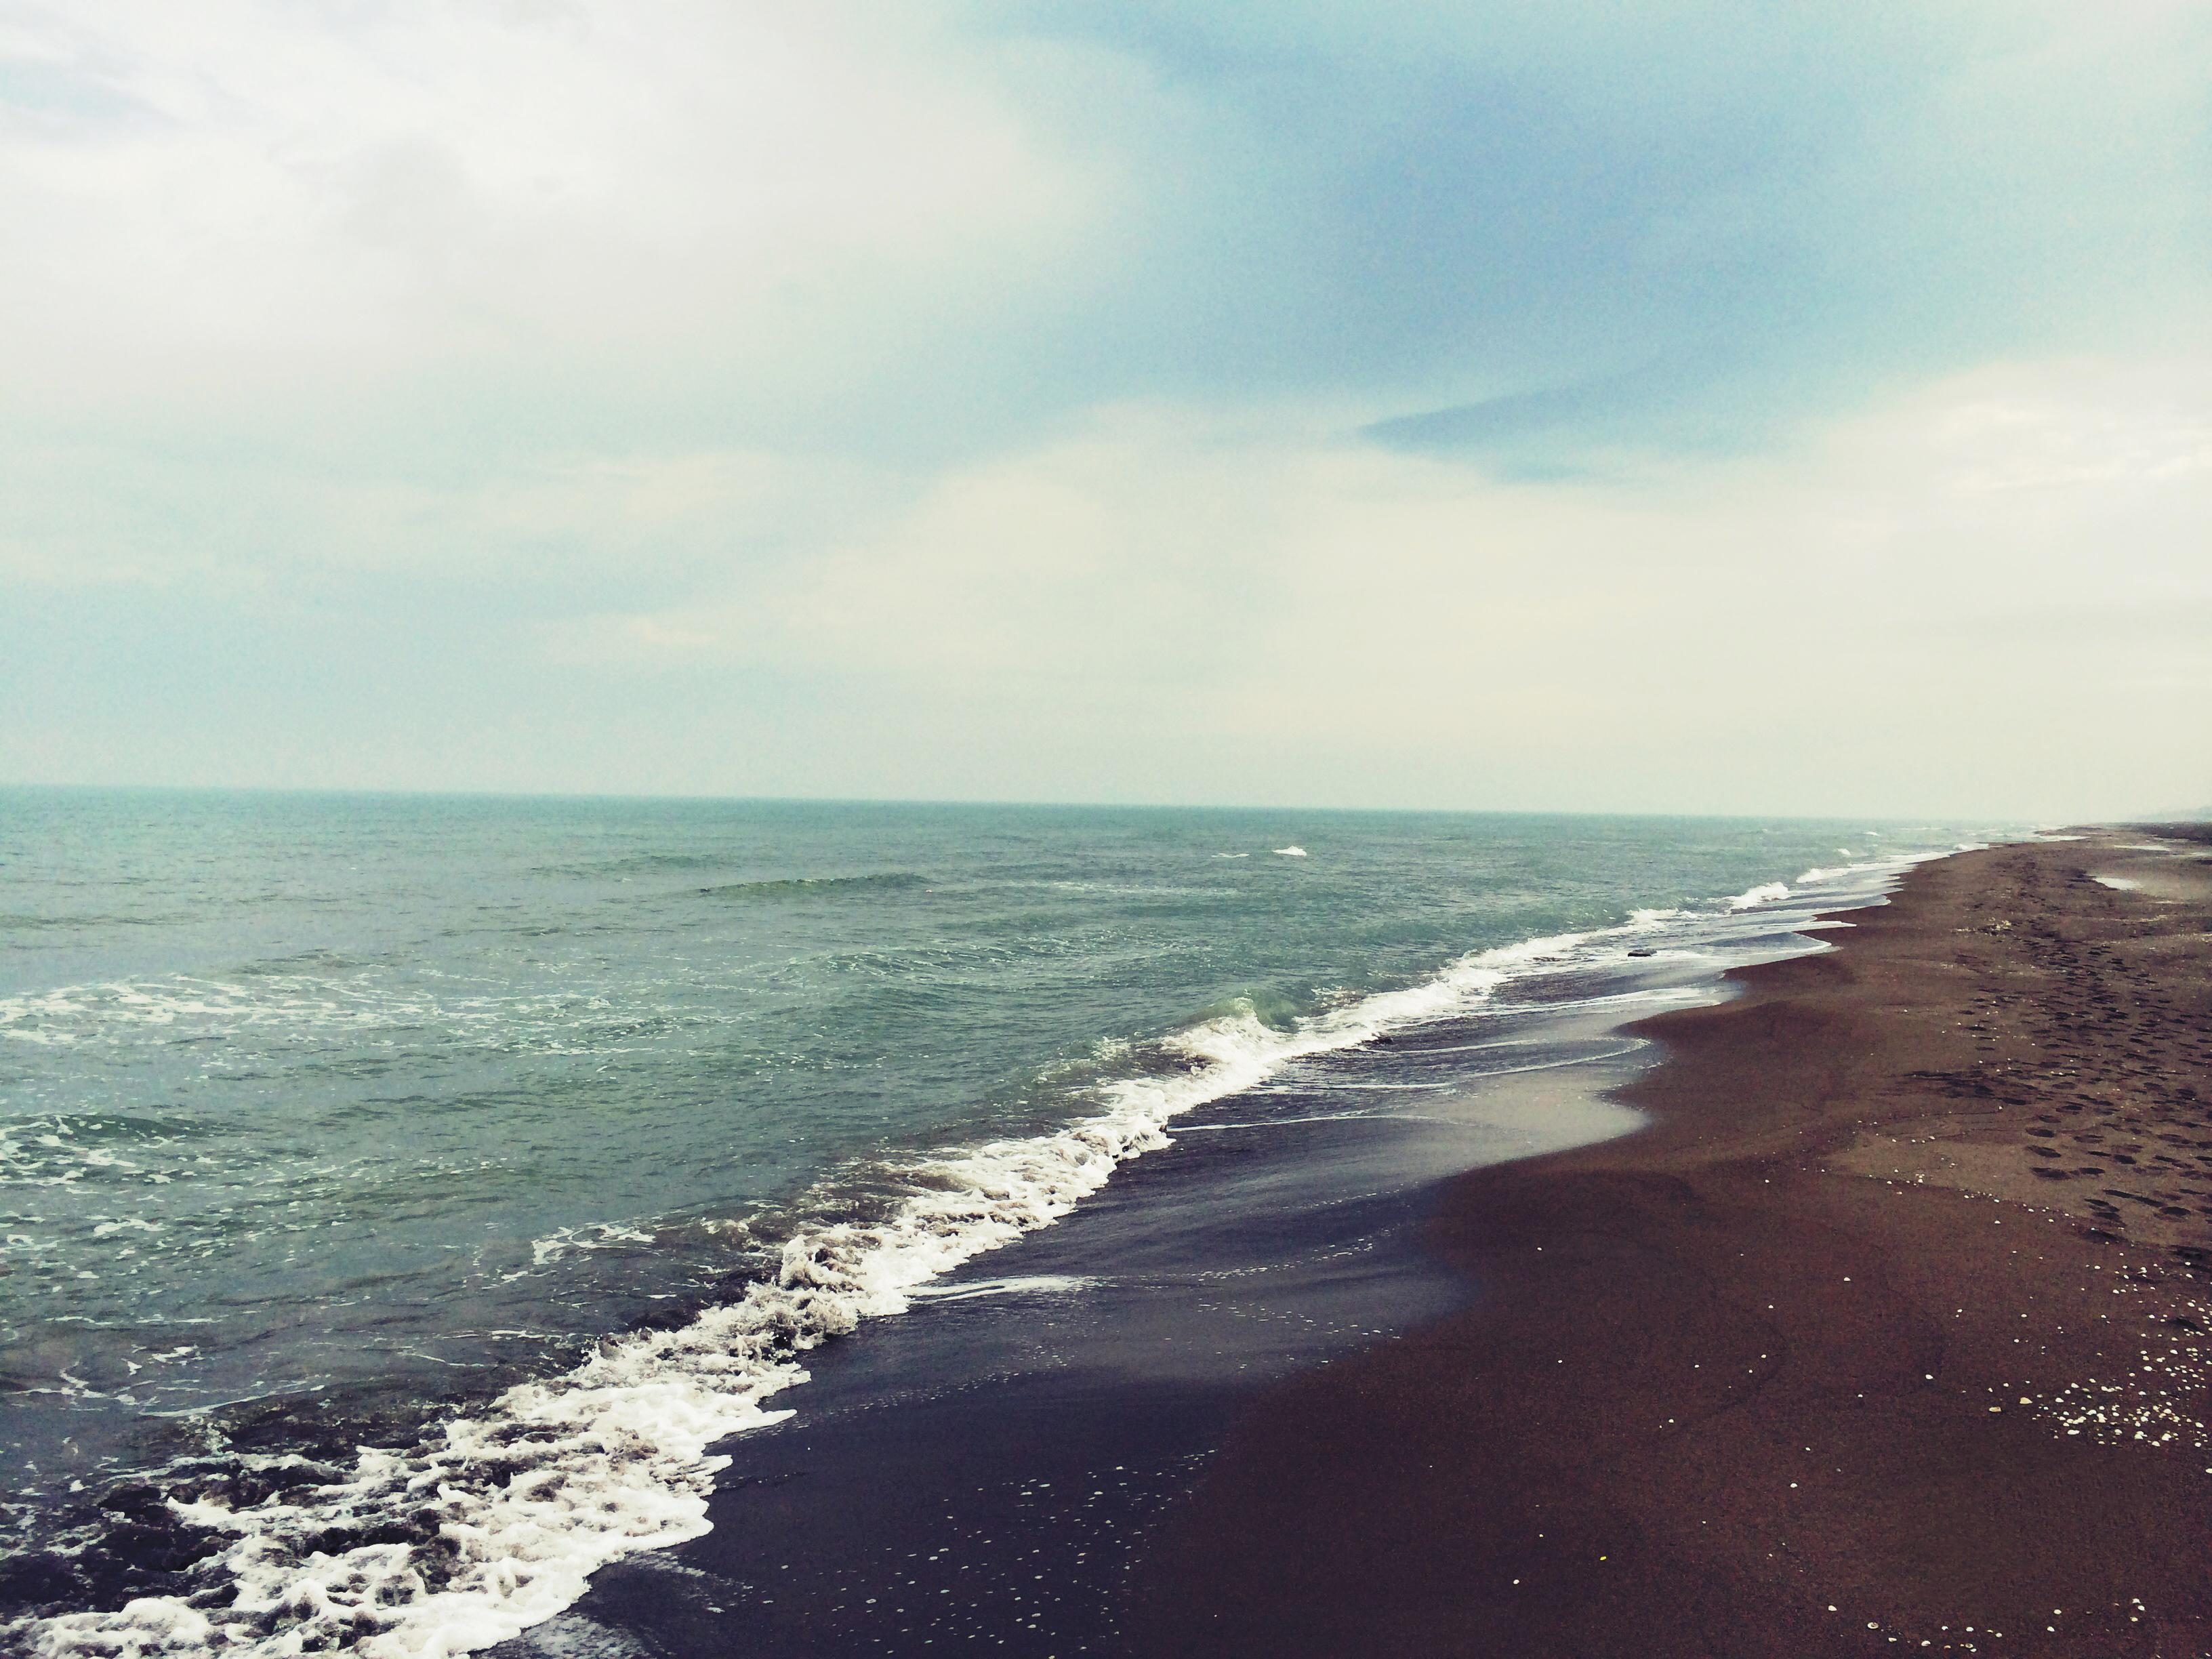 File:Caspian Sea Khezershahr beach.jpg - Wikimedia Commons